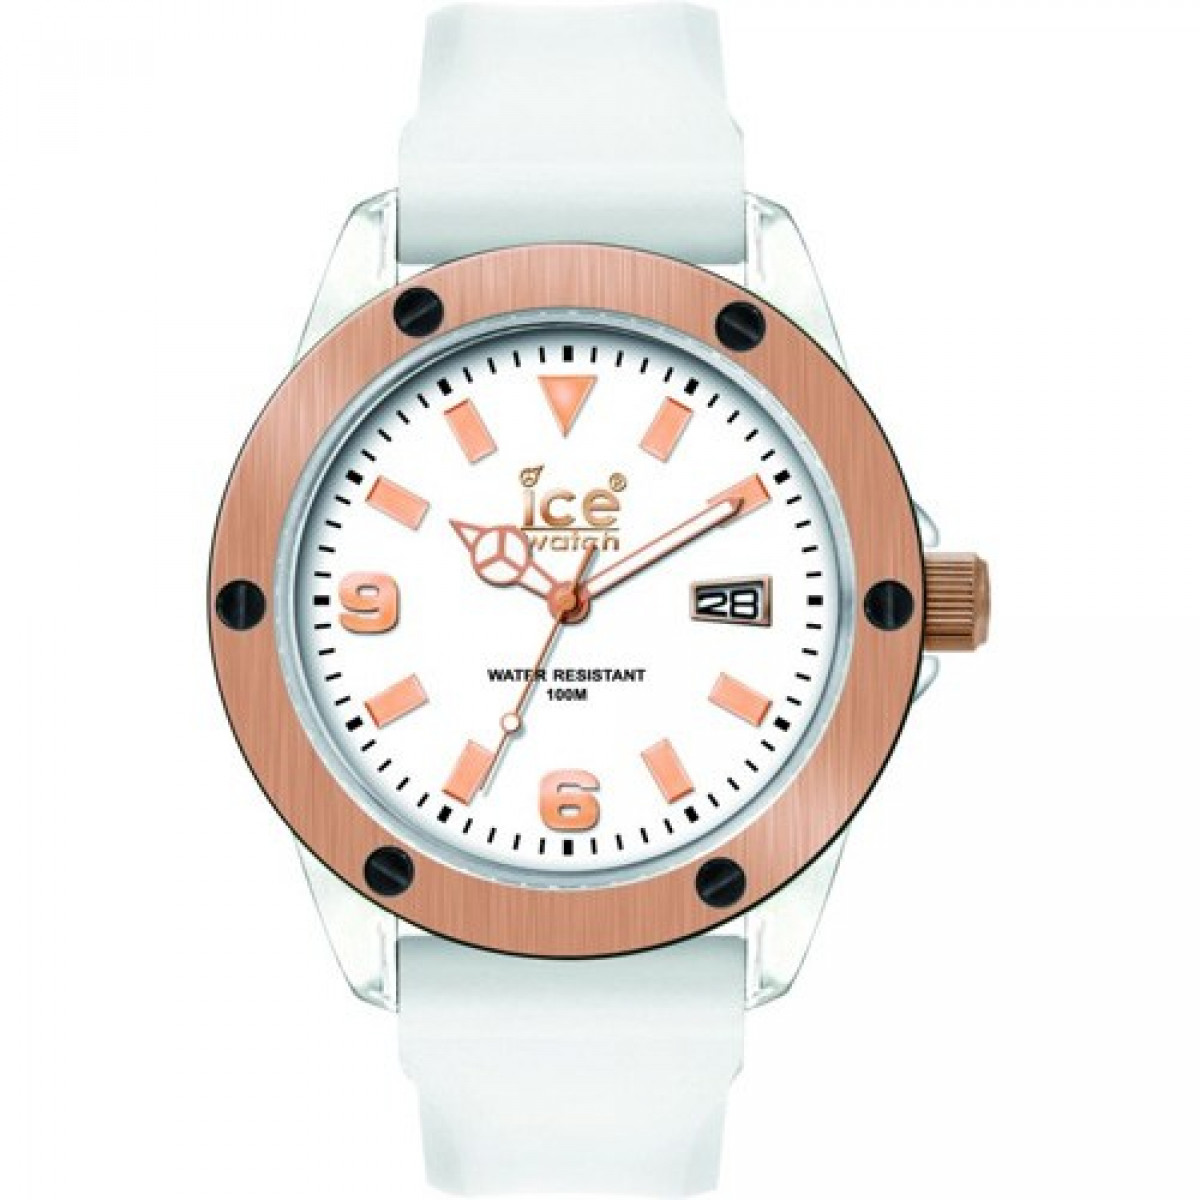 Часовник Ice-Watch XX.WE.XX.S.09 Big